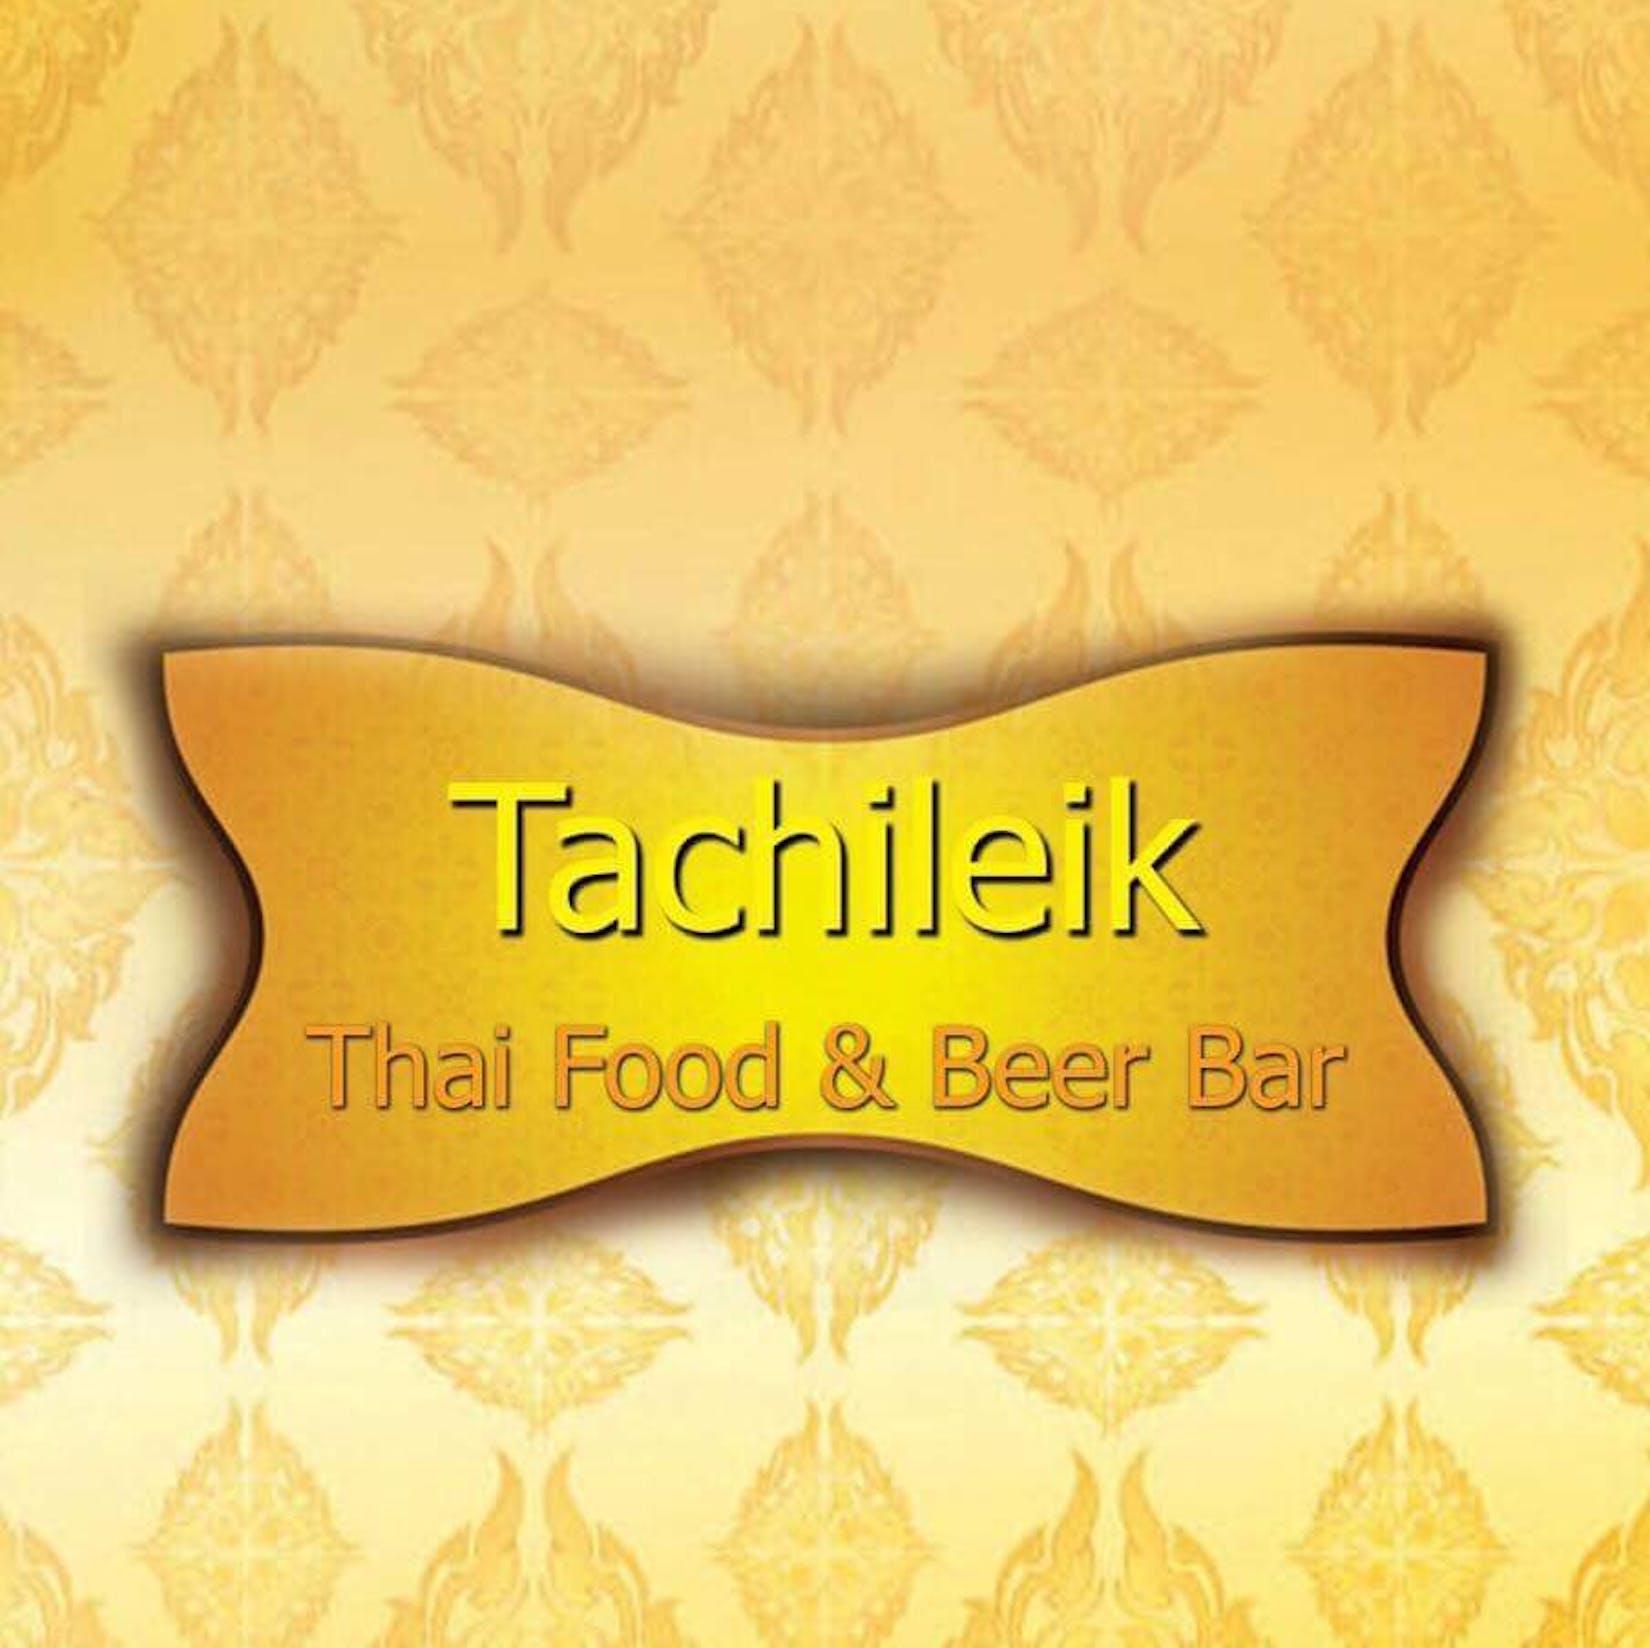 Tachileik Thai Food & Beer Bar | yathar